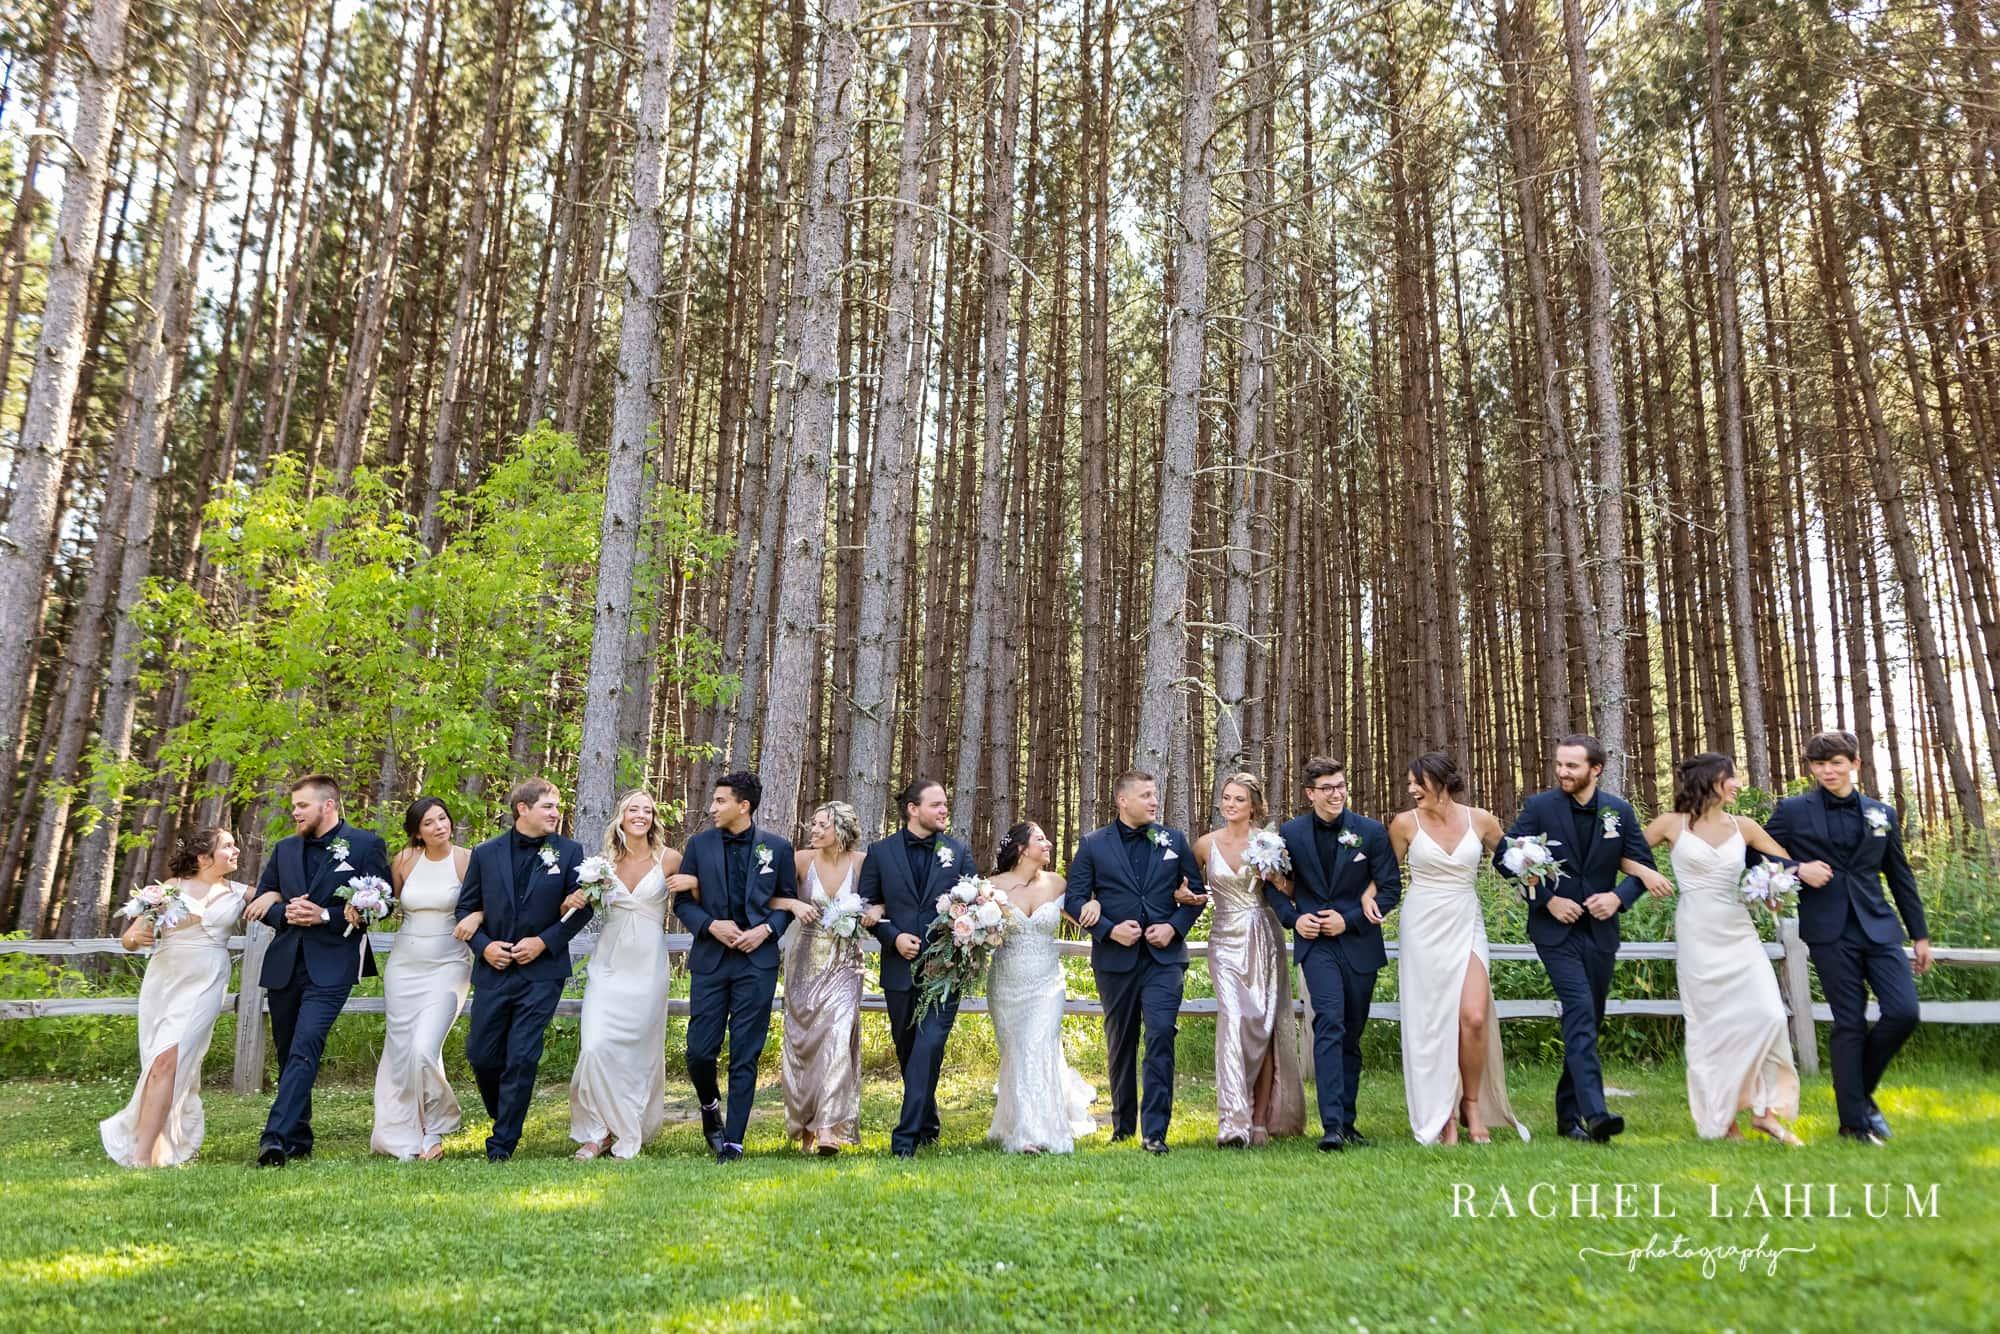 Bride, groom, groomsmen, and bridesmaids walk with arm in arm in field near Bigfork, Minnesota.